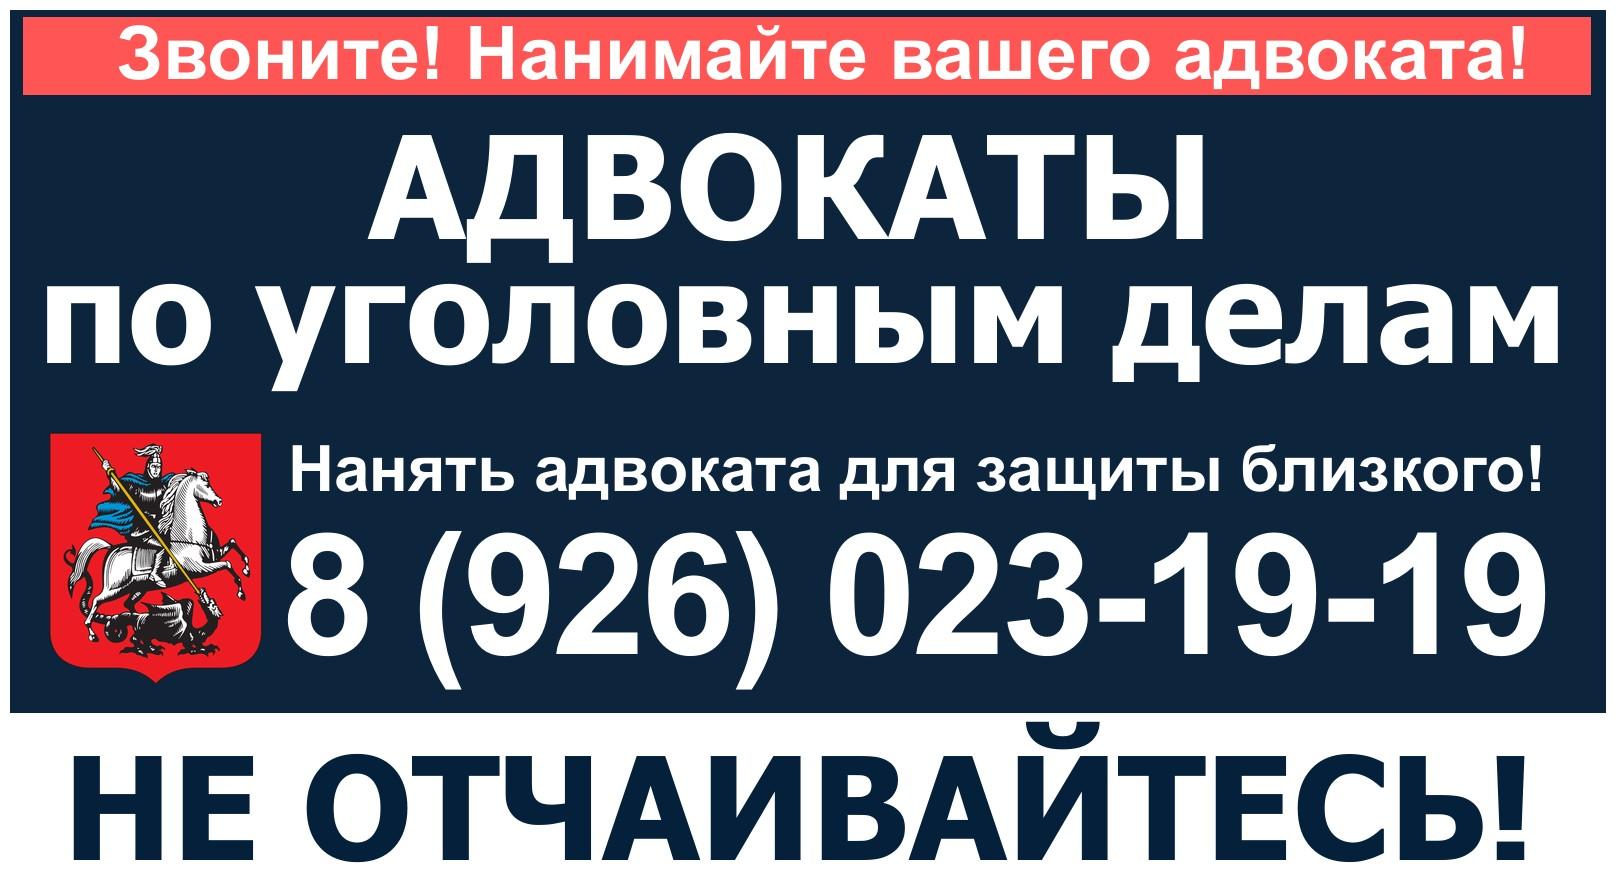 СИЗО Волоколамск телефон